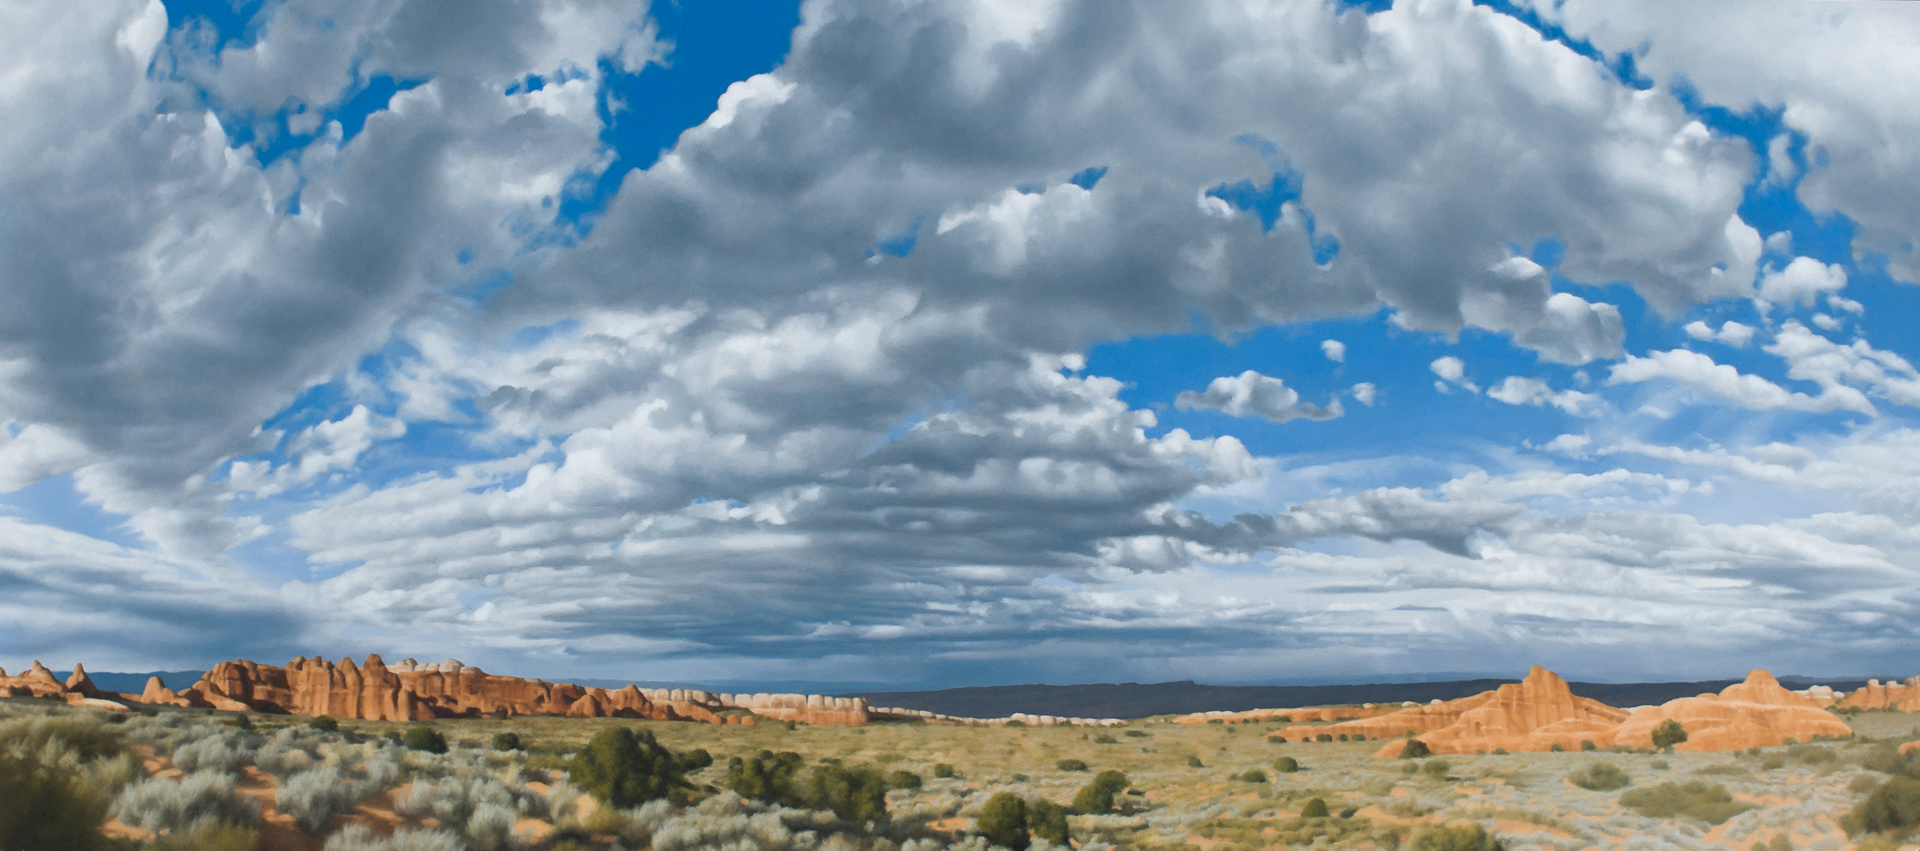 Desert Skyscape I by Patrick Kramer